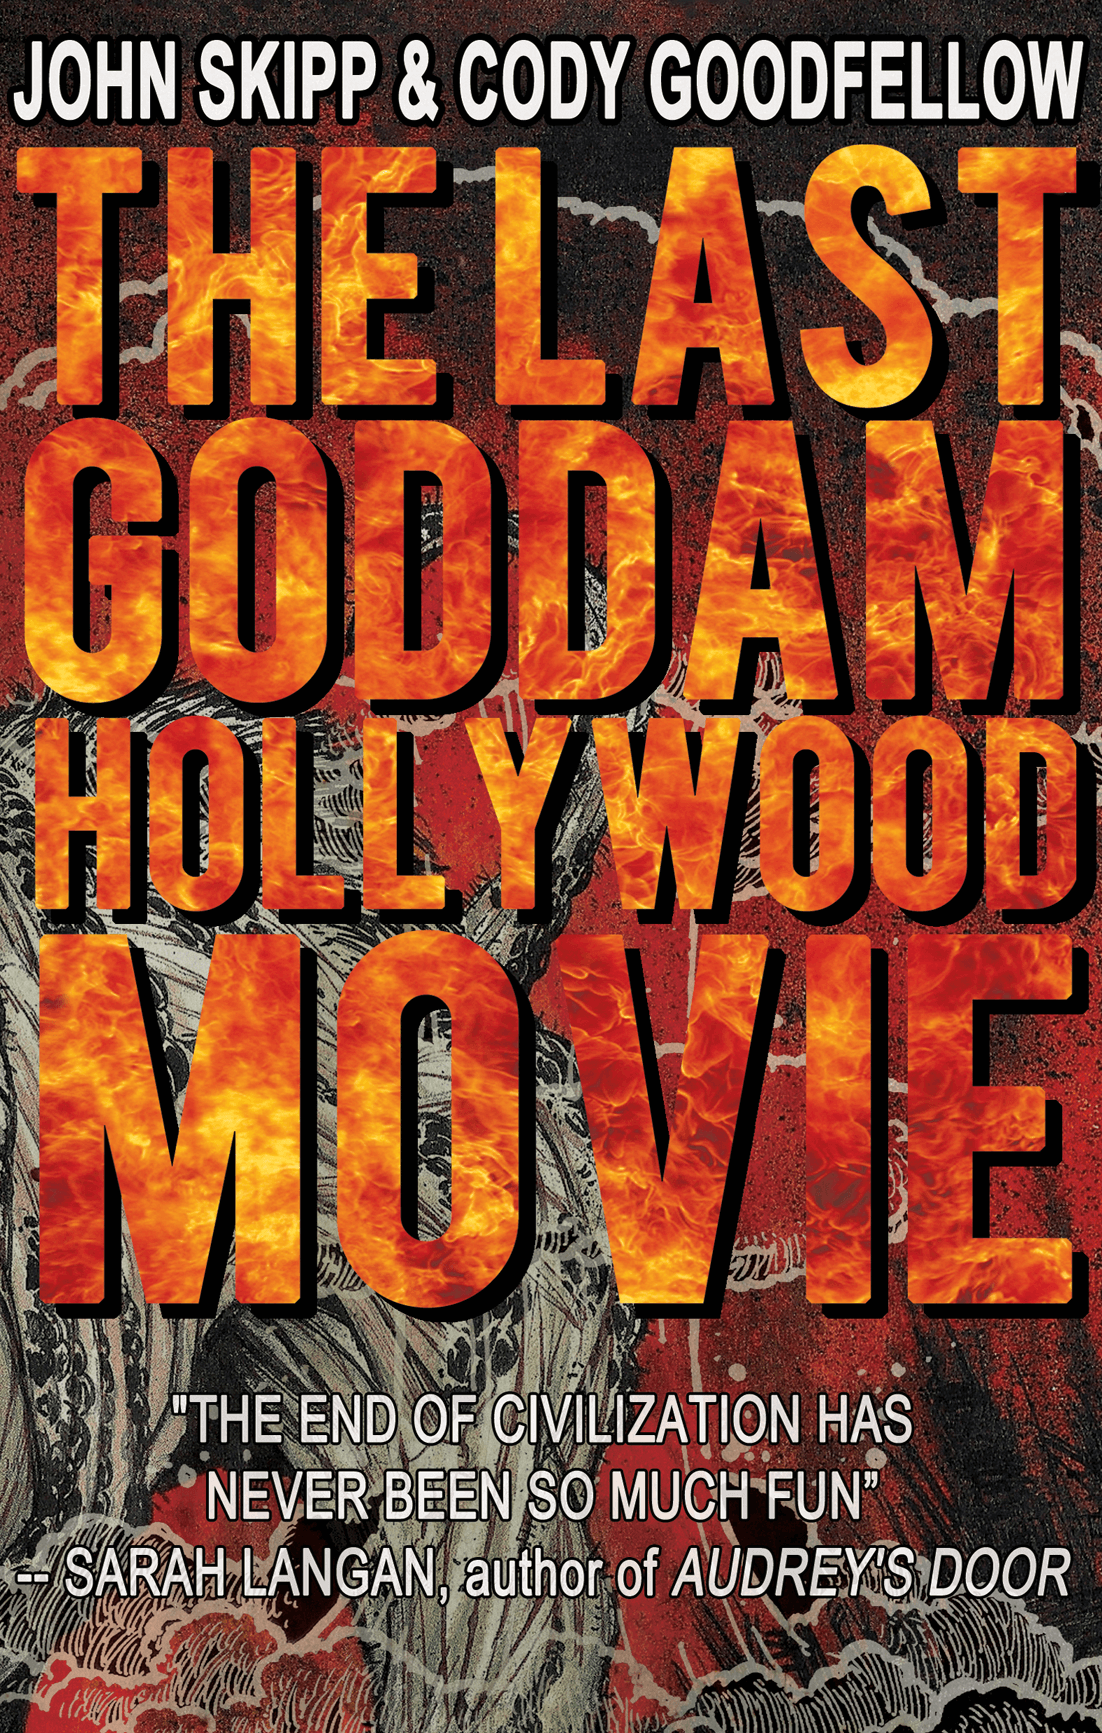 The Last Goddam Hollywood Movie by John Skipp & Cody Goodfellow